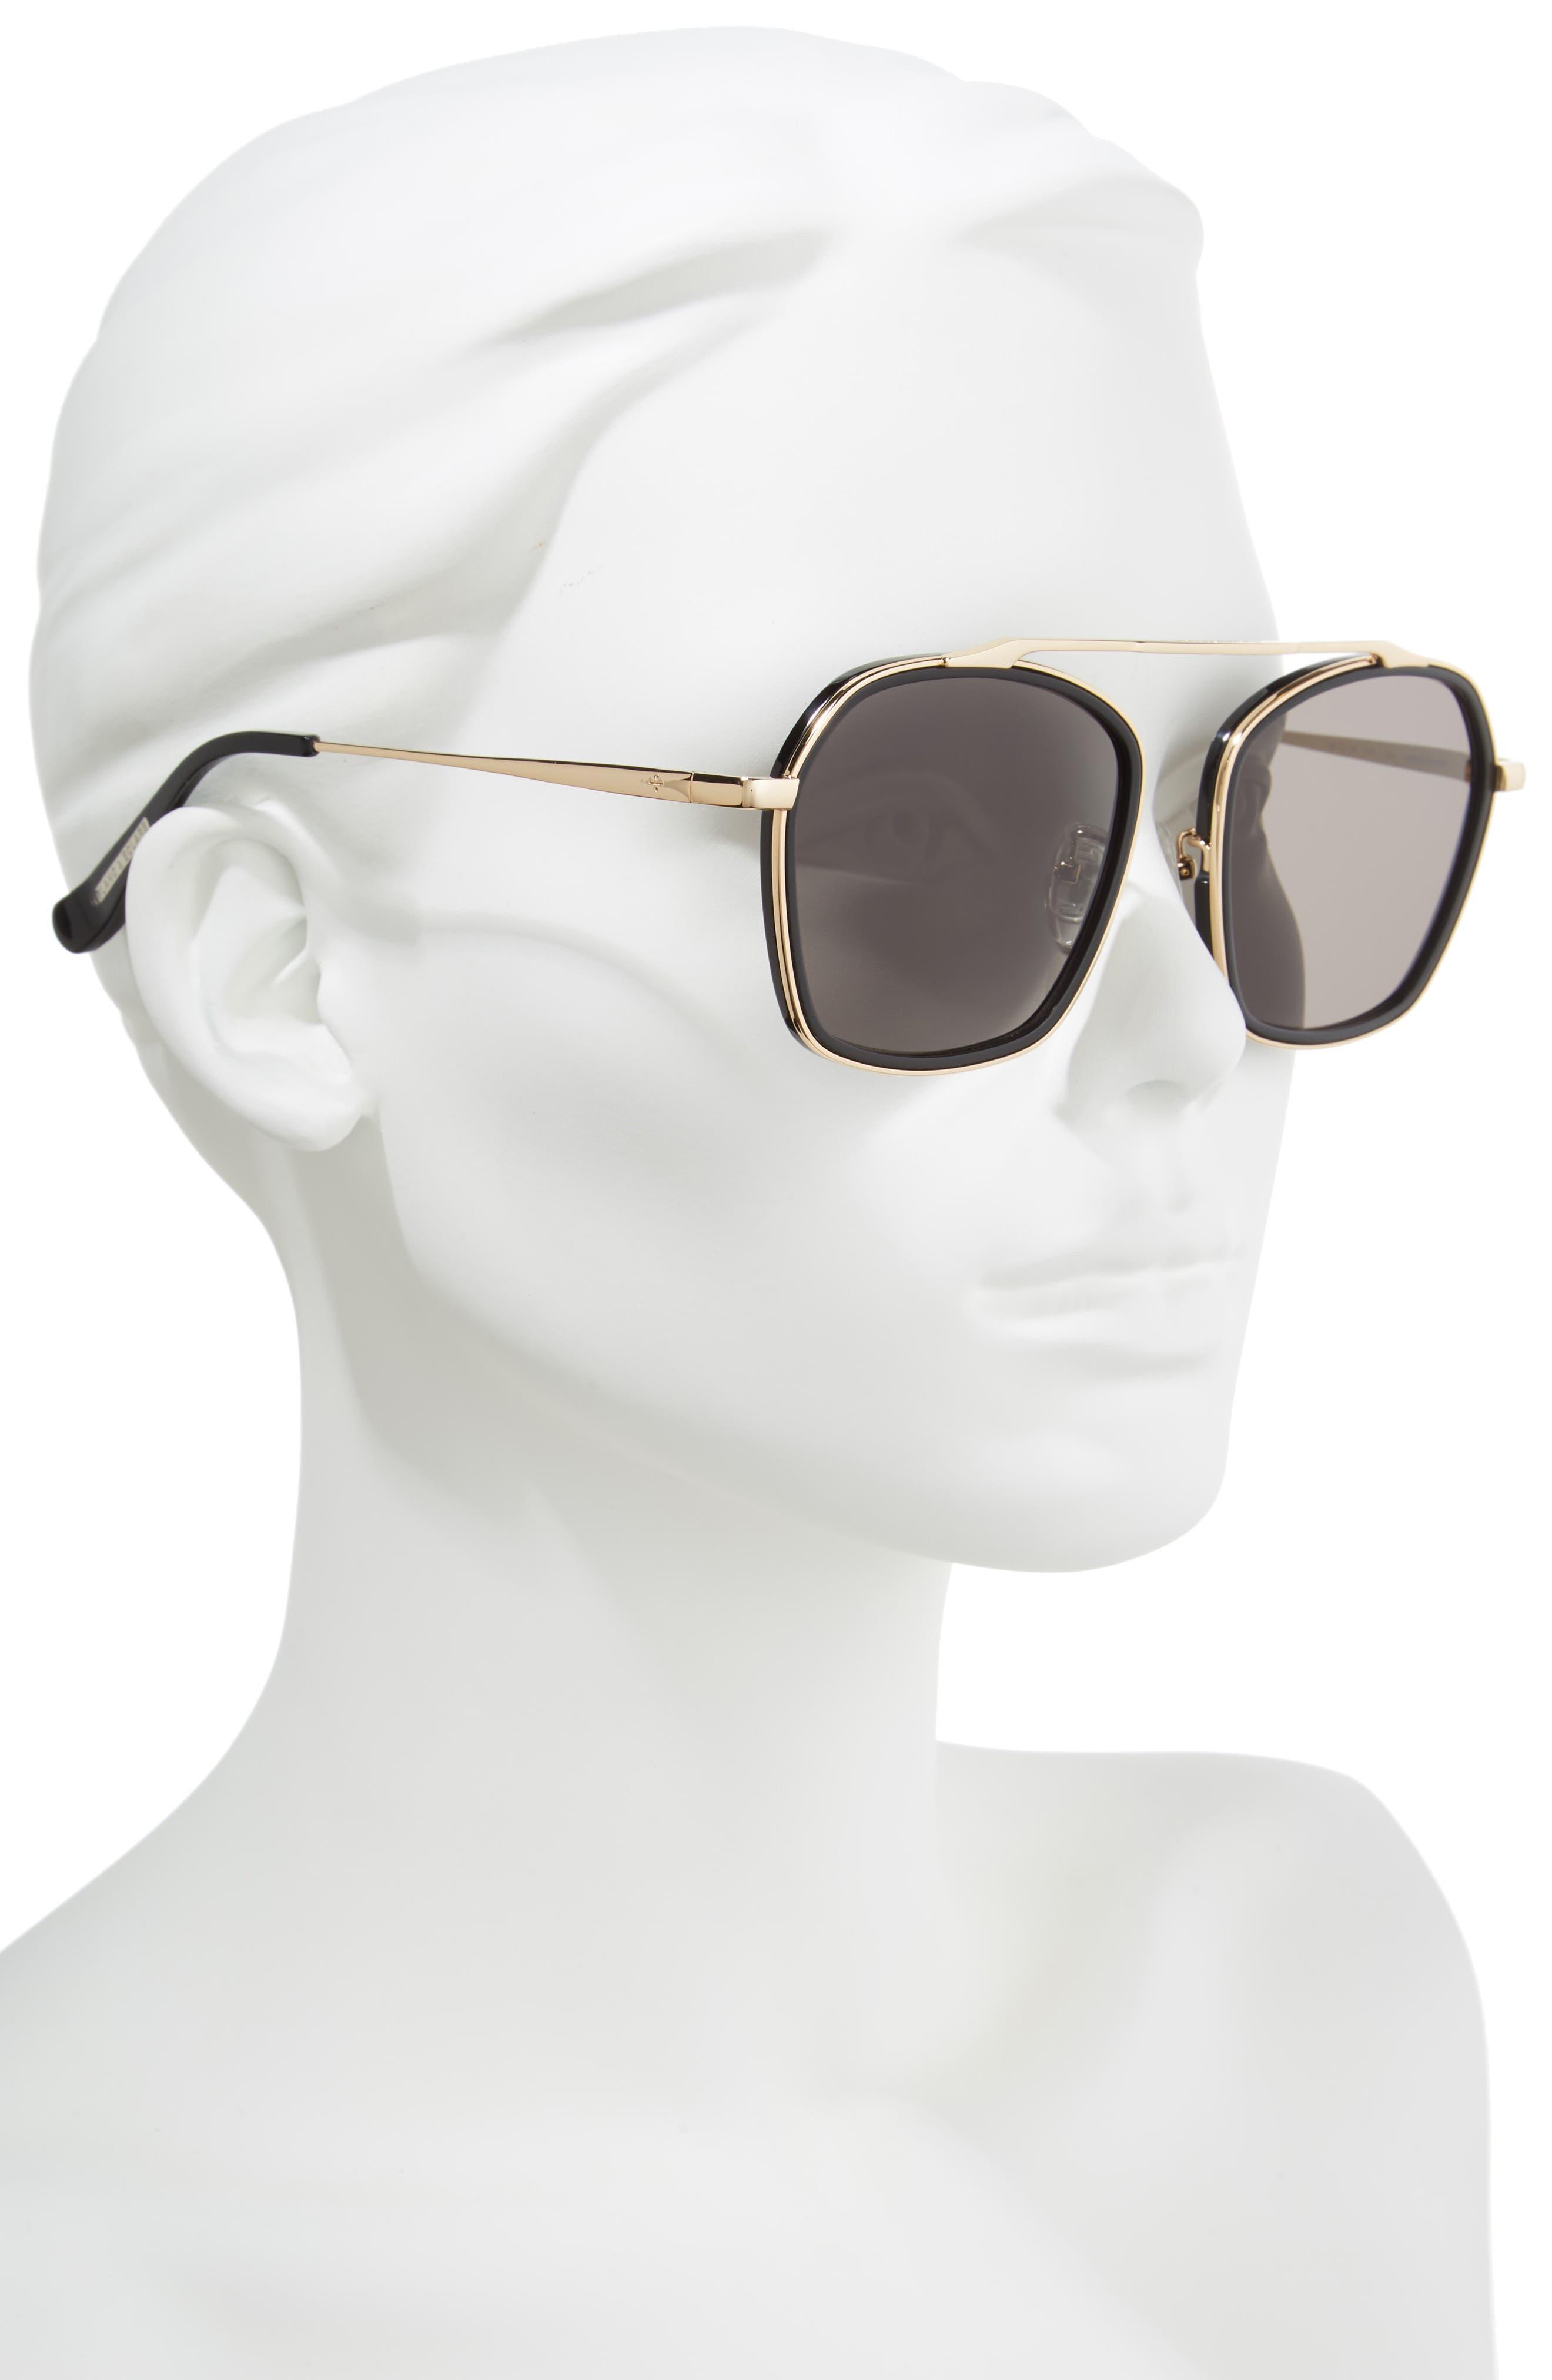 BLANC & ECLARE Vancouver 58mm Polarized Aviator Sunglasses,                             Alternate thumbnail 2, color,                             Black/ Gold/ Smog Grey